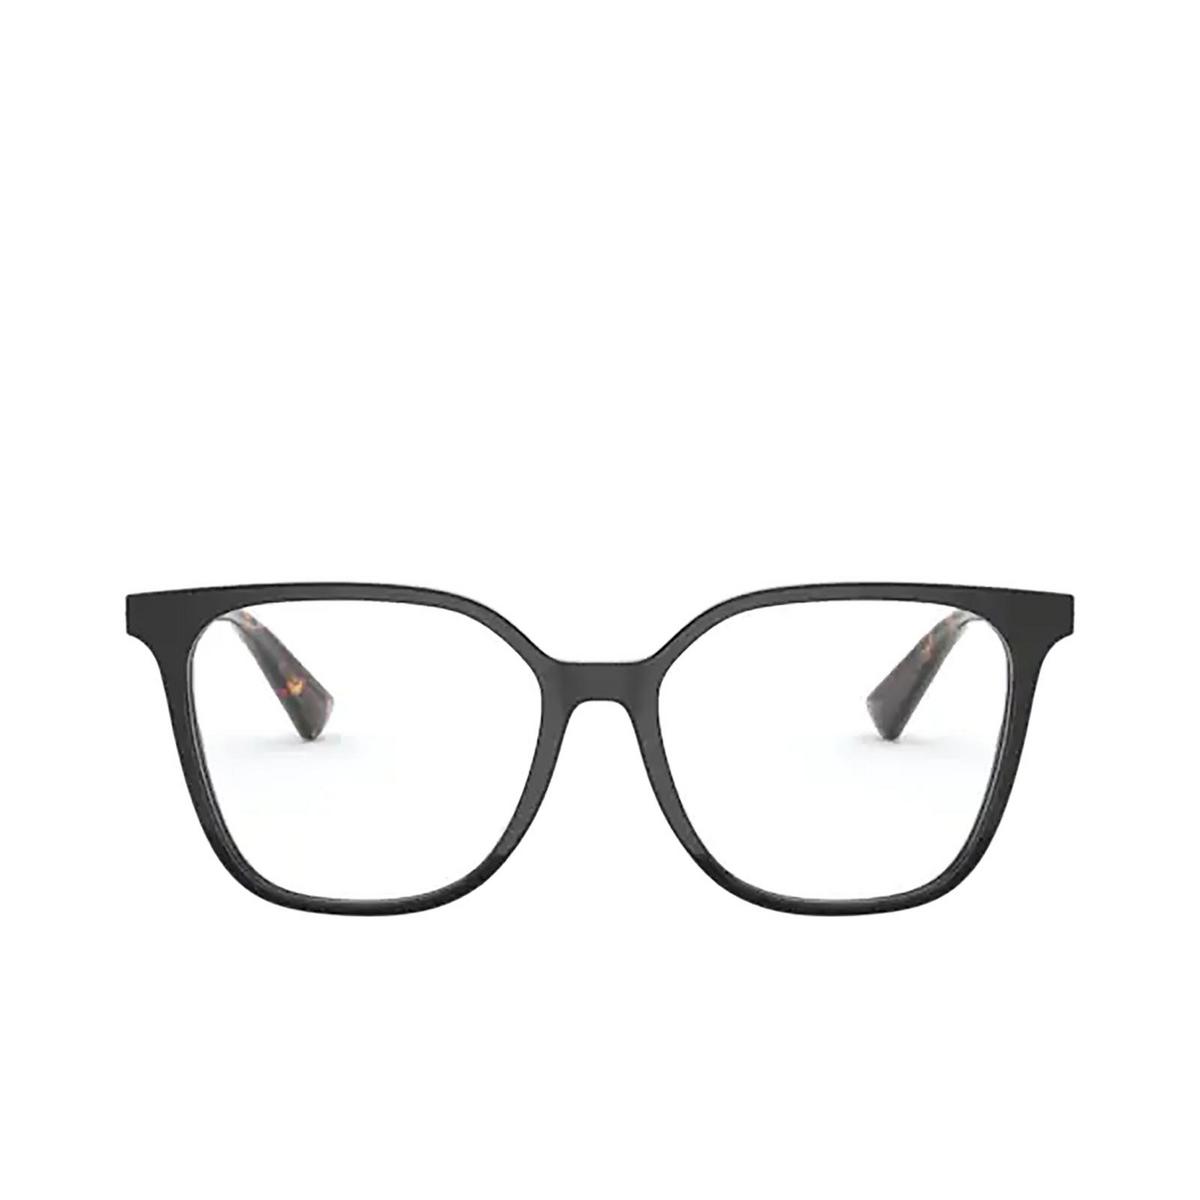 Valentino® Square Eyeglasses: VA3055 color Black 5001 - front view.